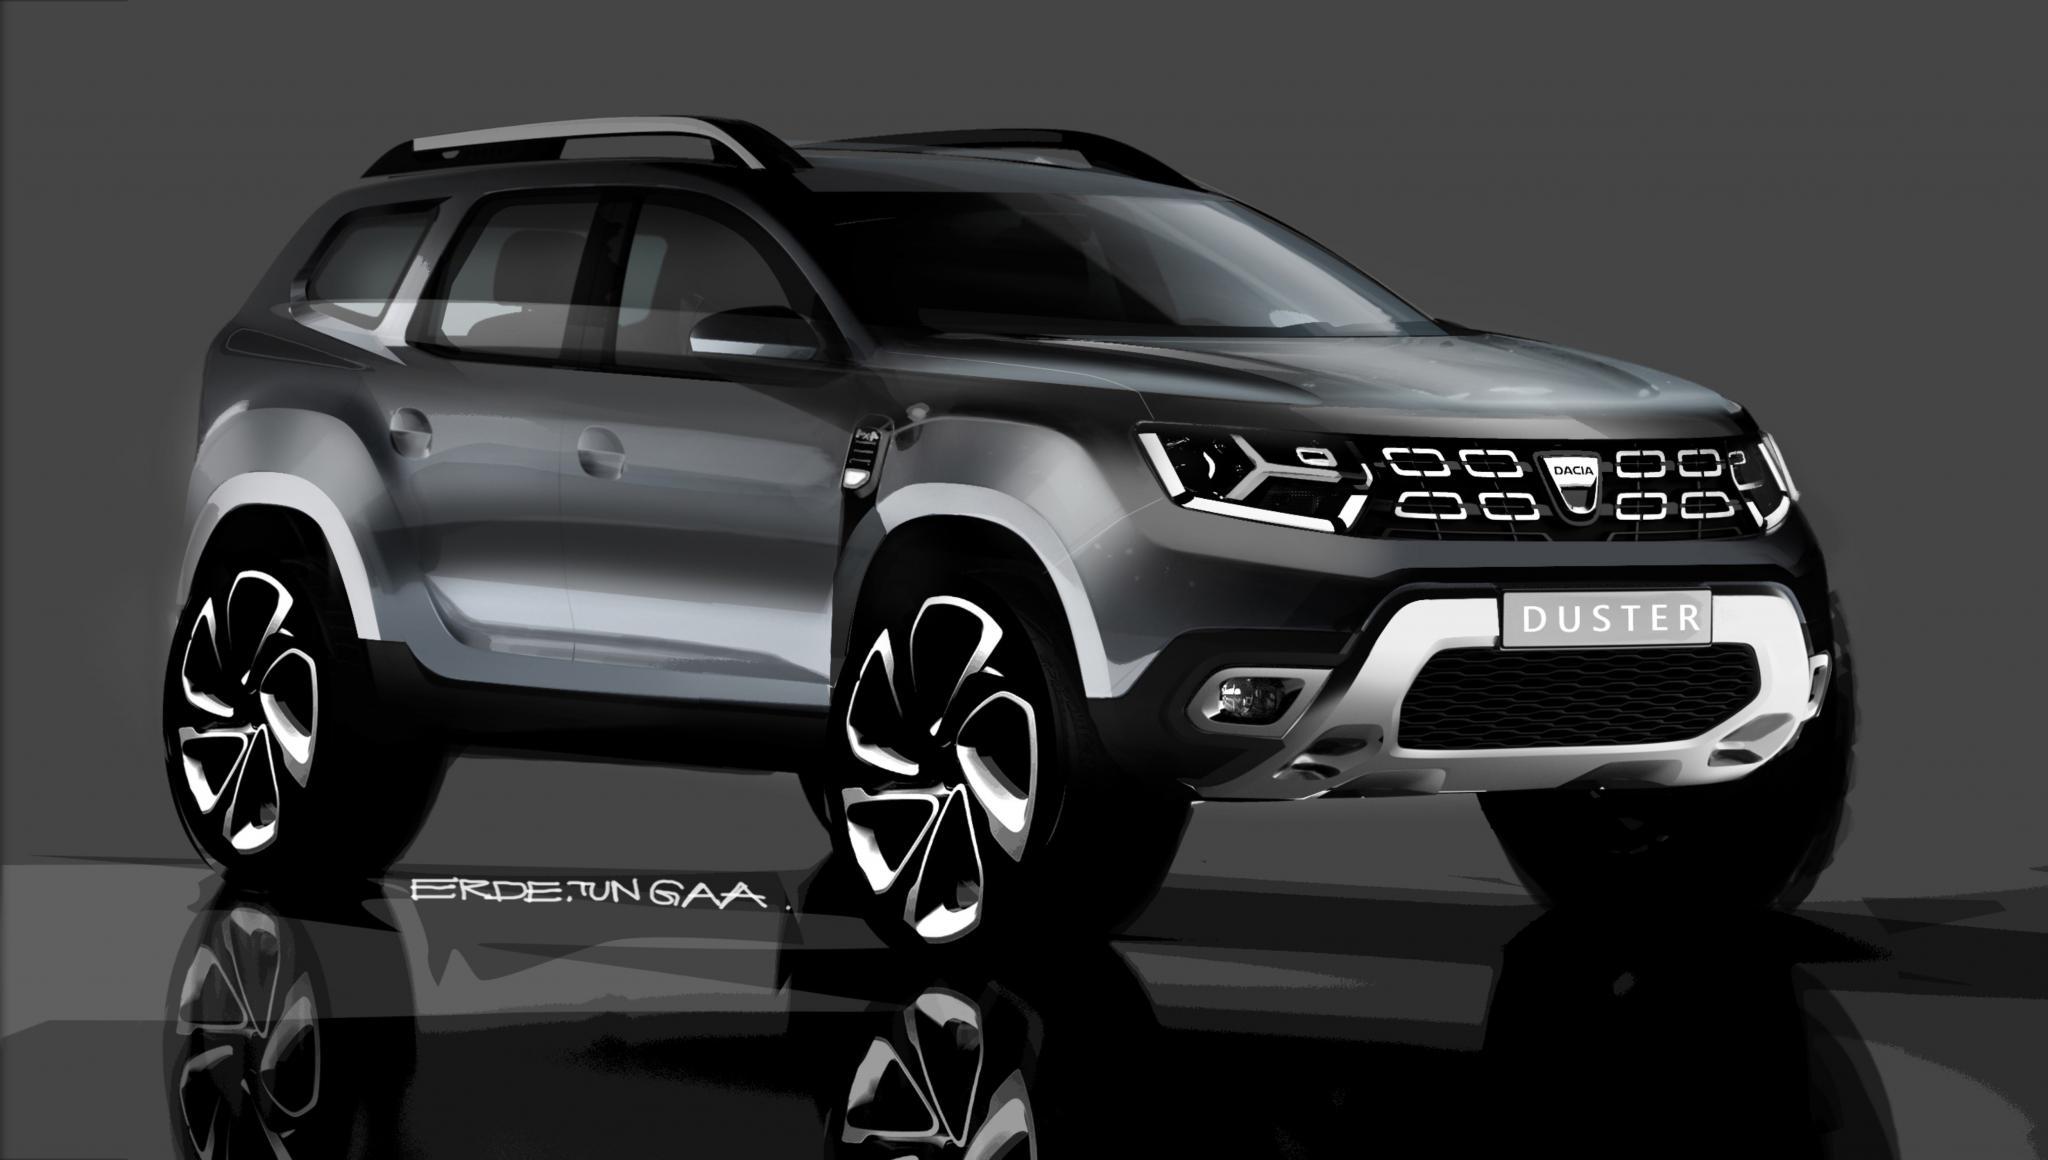 Nowa dacia duster pierwsze zdj cia modelu for Dacia duster 2017 interni